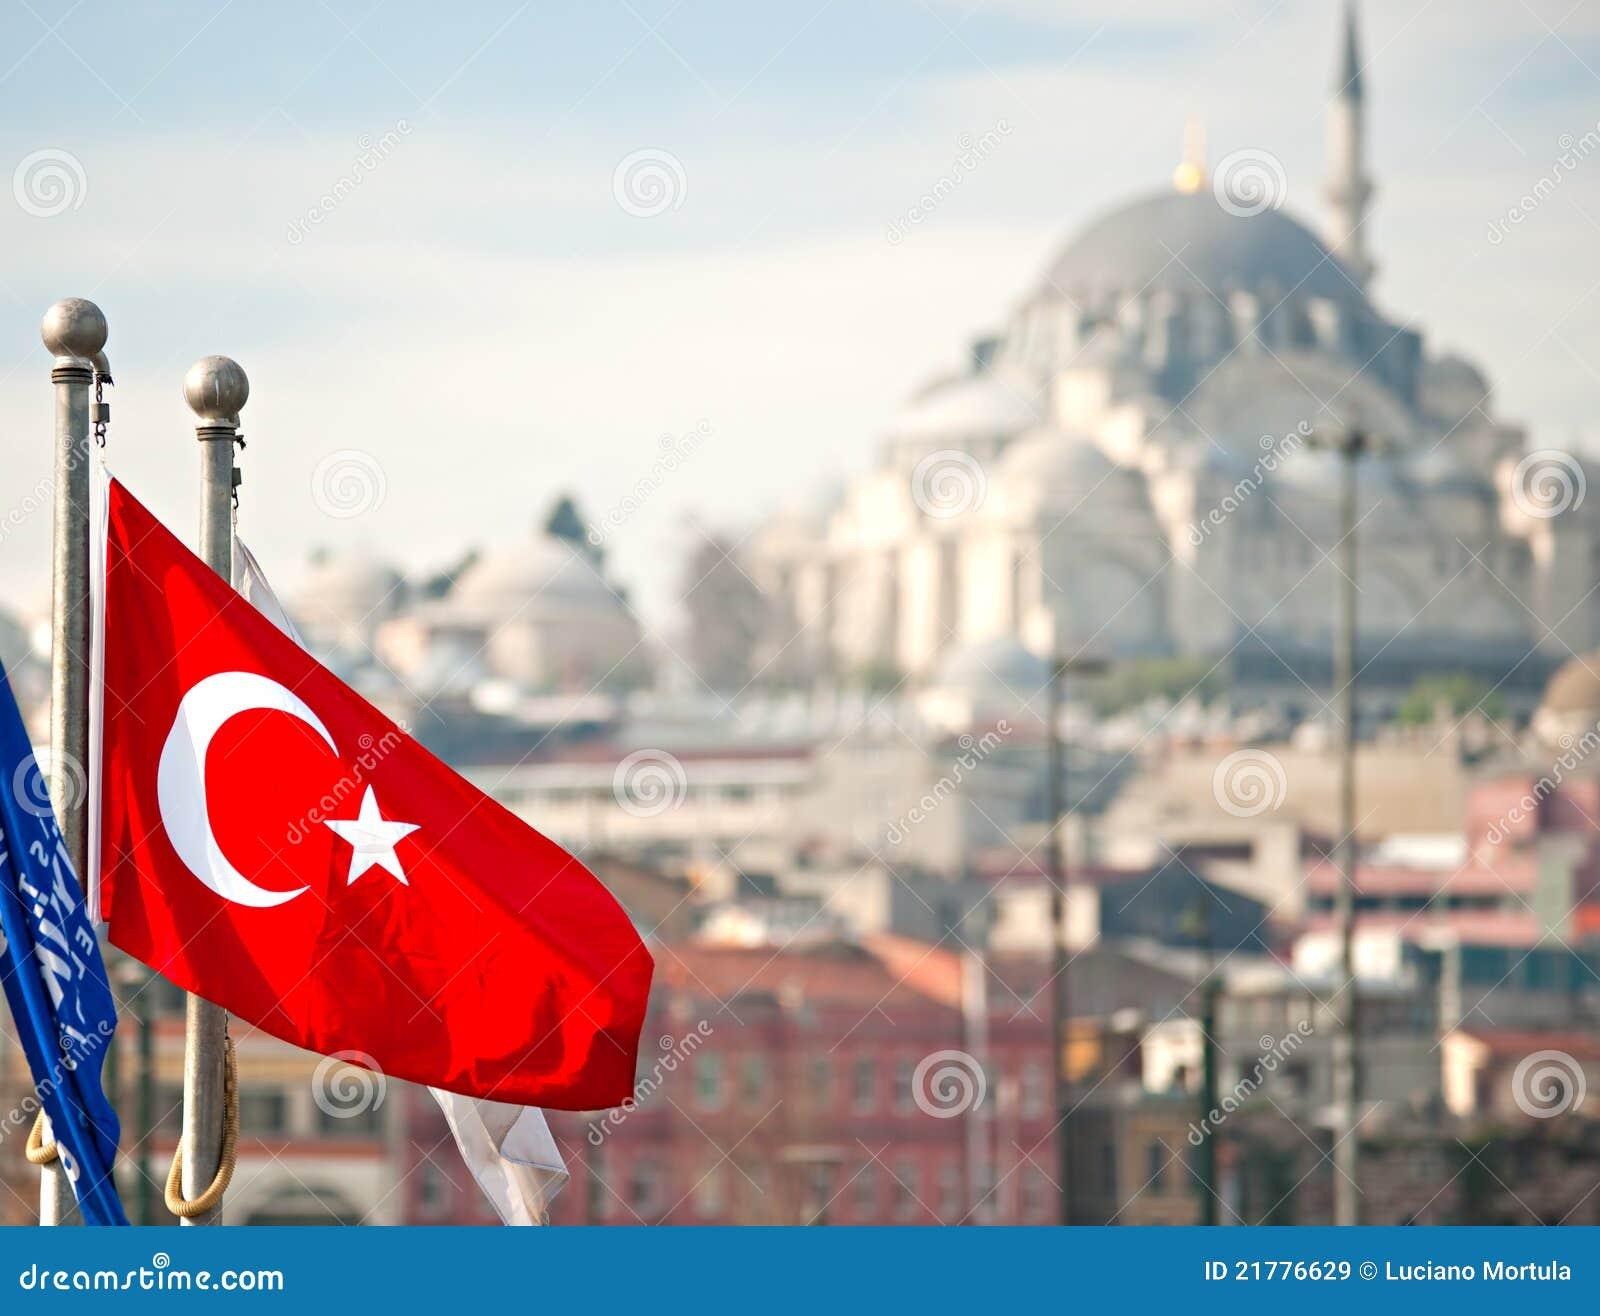 Turkey Flag, Istanbul, Turkey. Royalty Free Stock Images ...